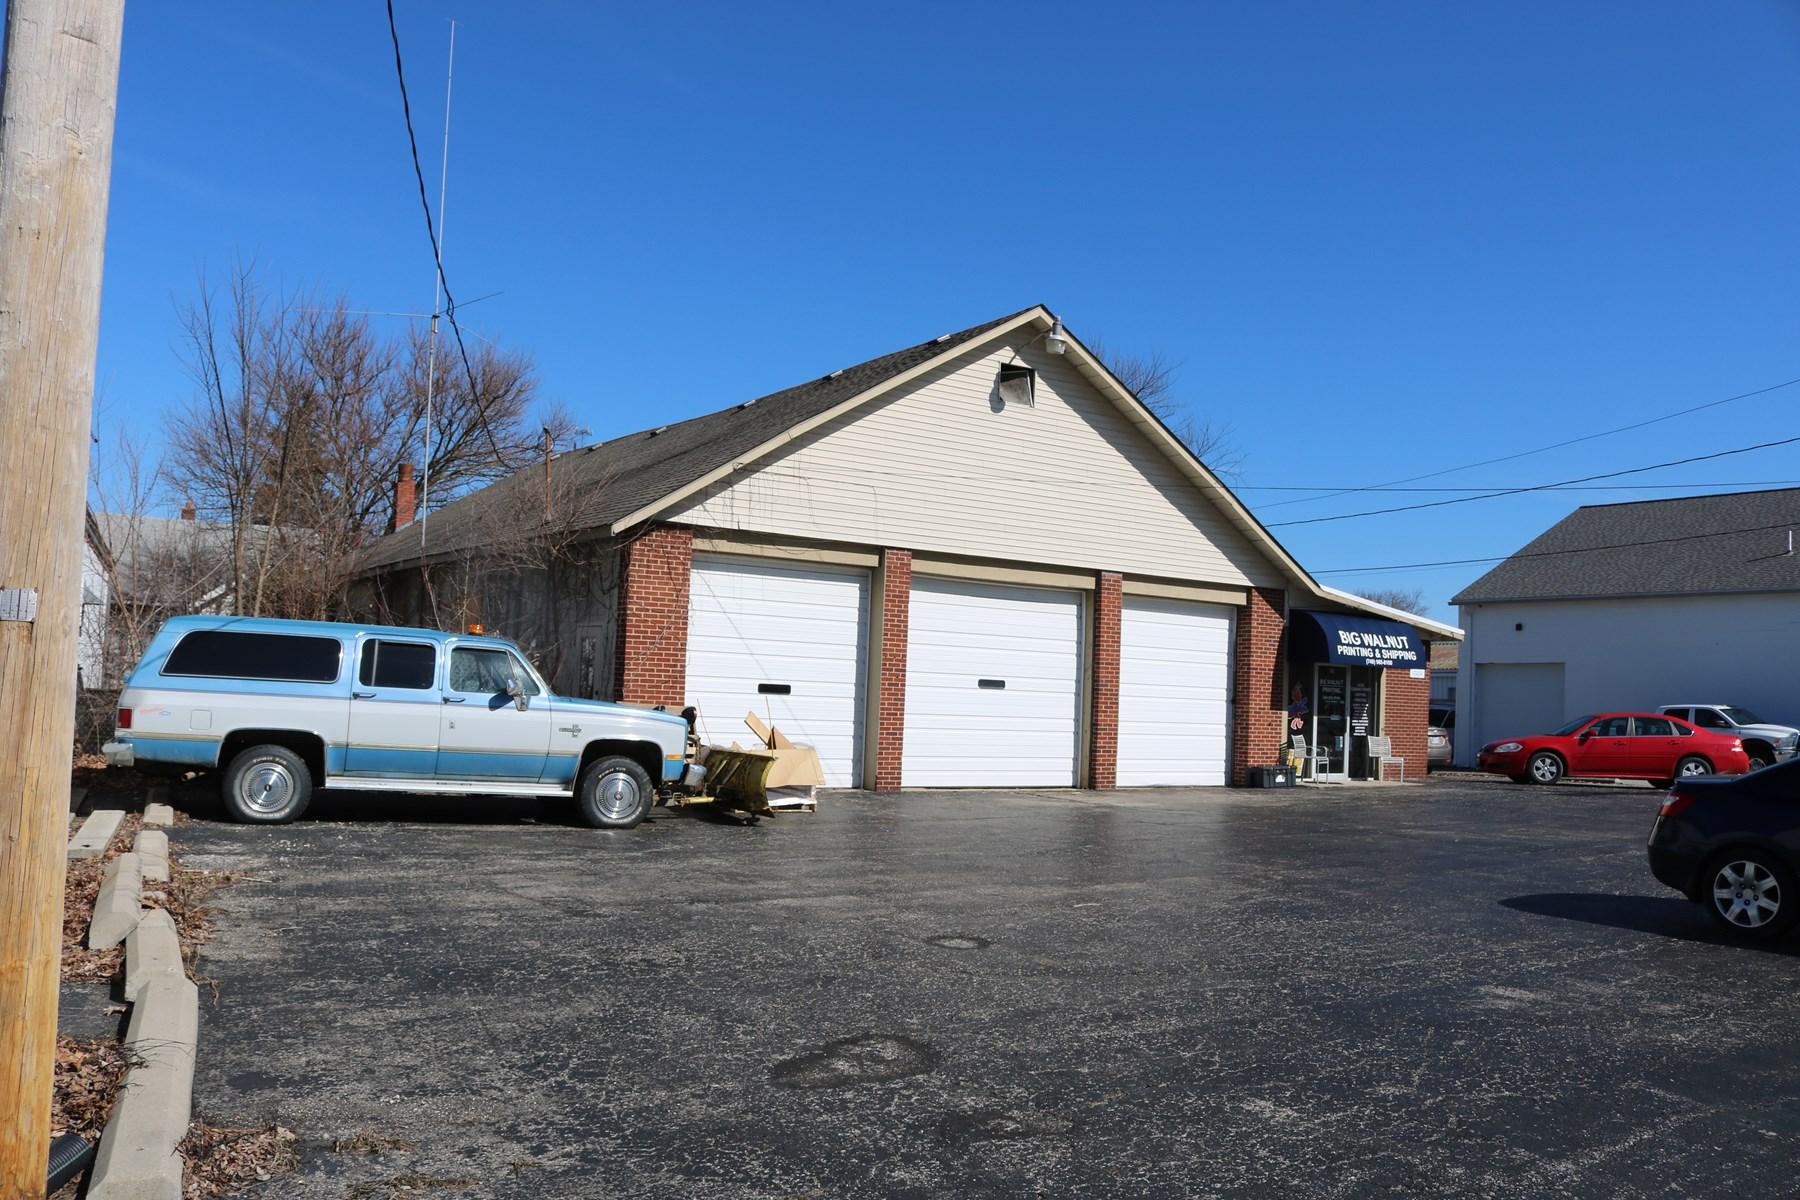 Commercial Property, Delaware County, Sunbury, Ohio